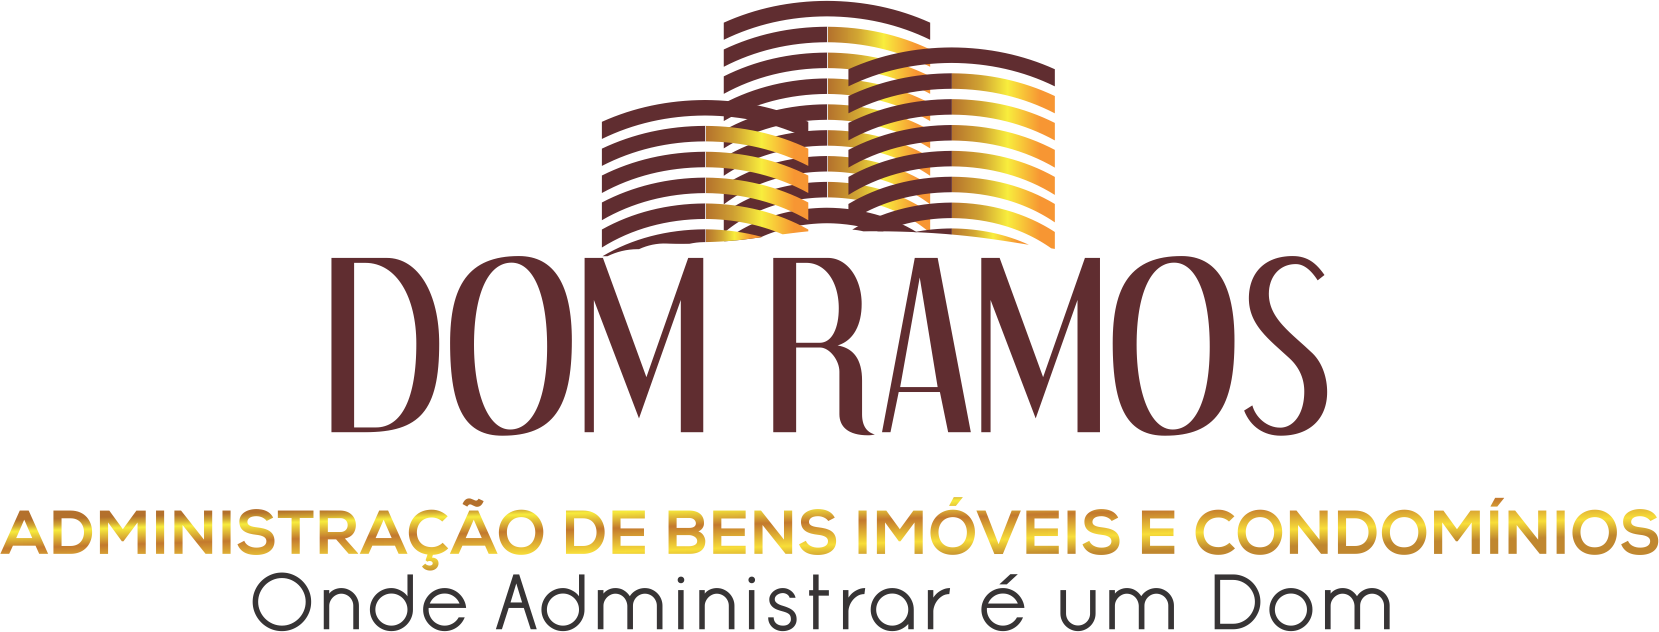 DOM RAMOS ADMINISTRACAO DE BENS IMOVEIS E CONDOMIN